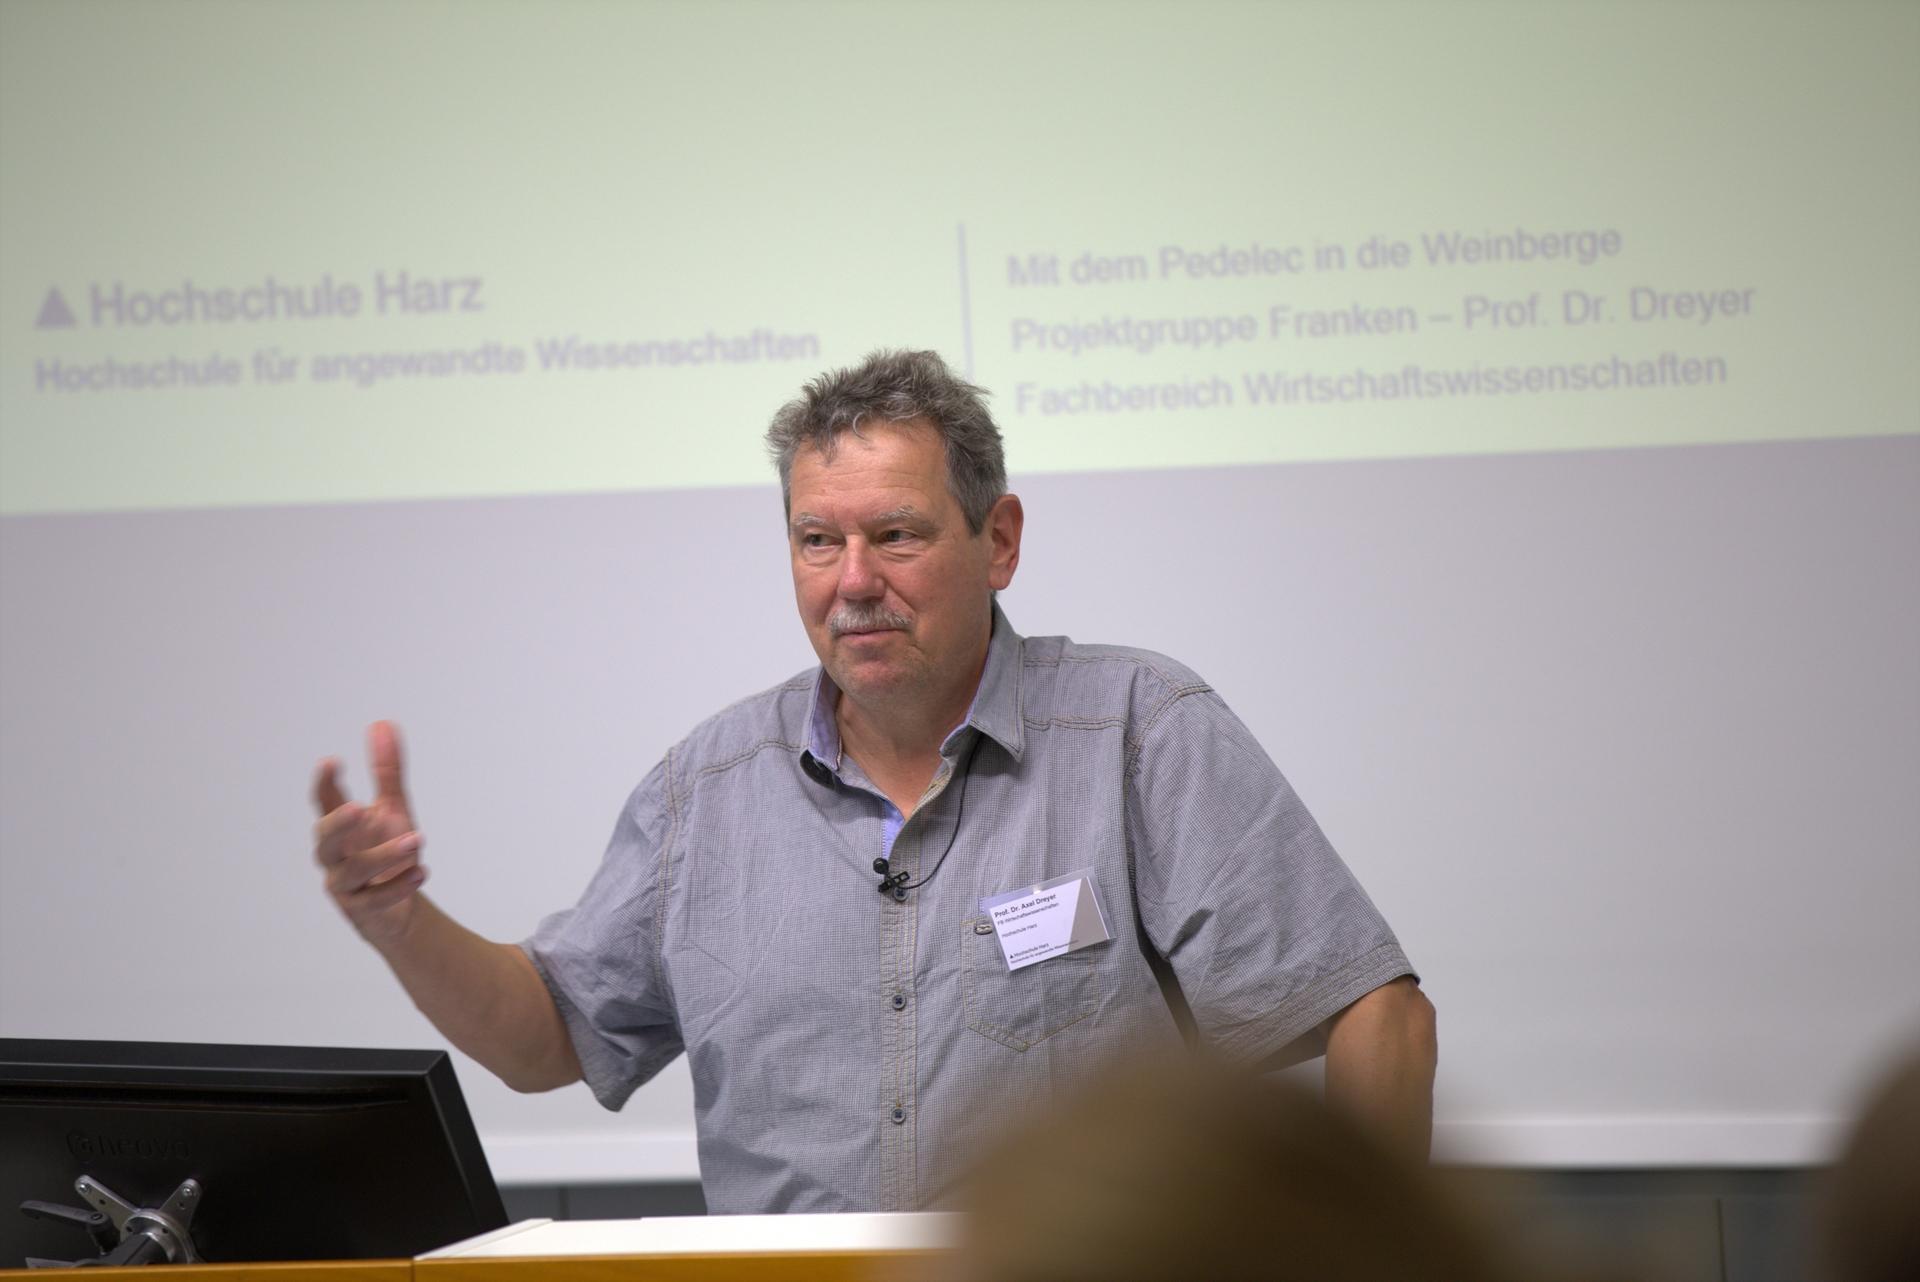 Prof. Dr. Axel Dreyer